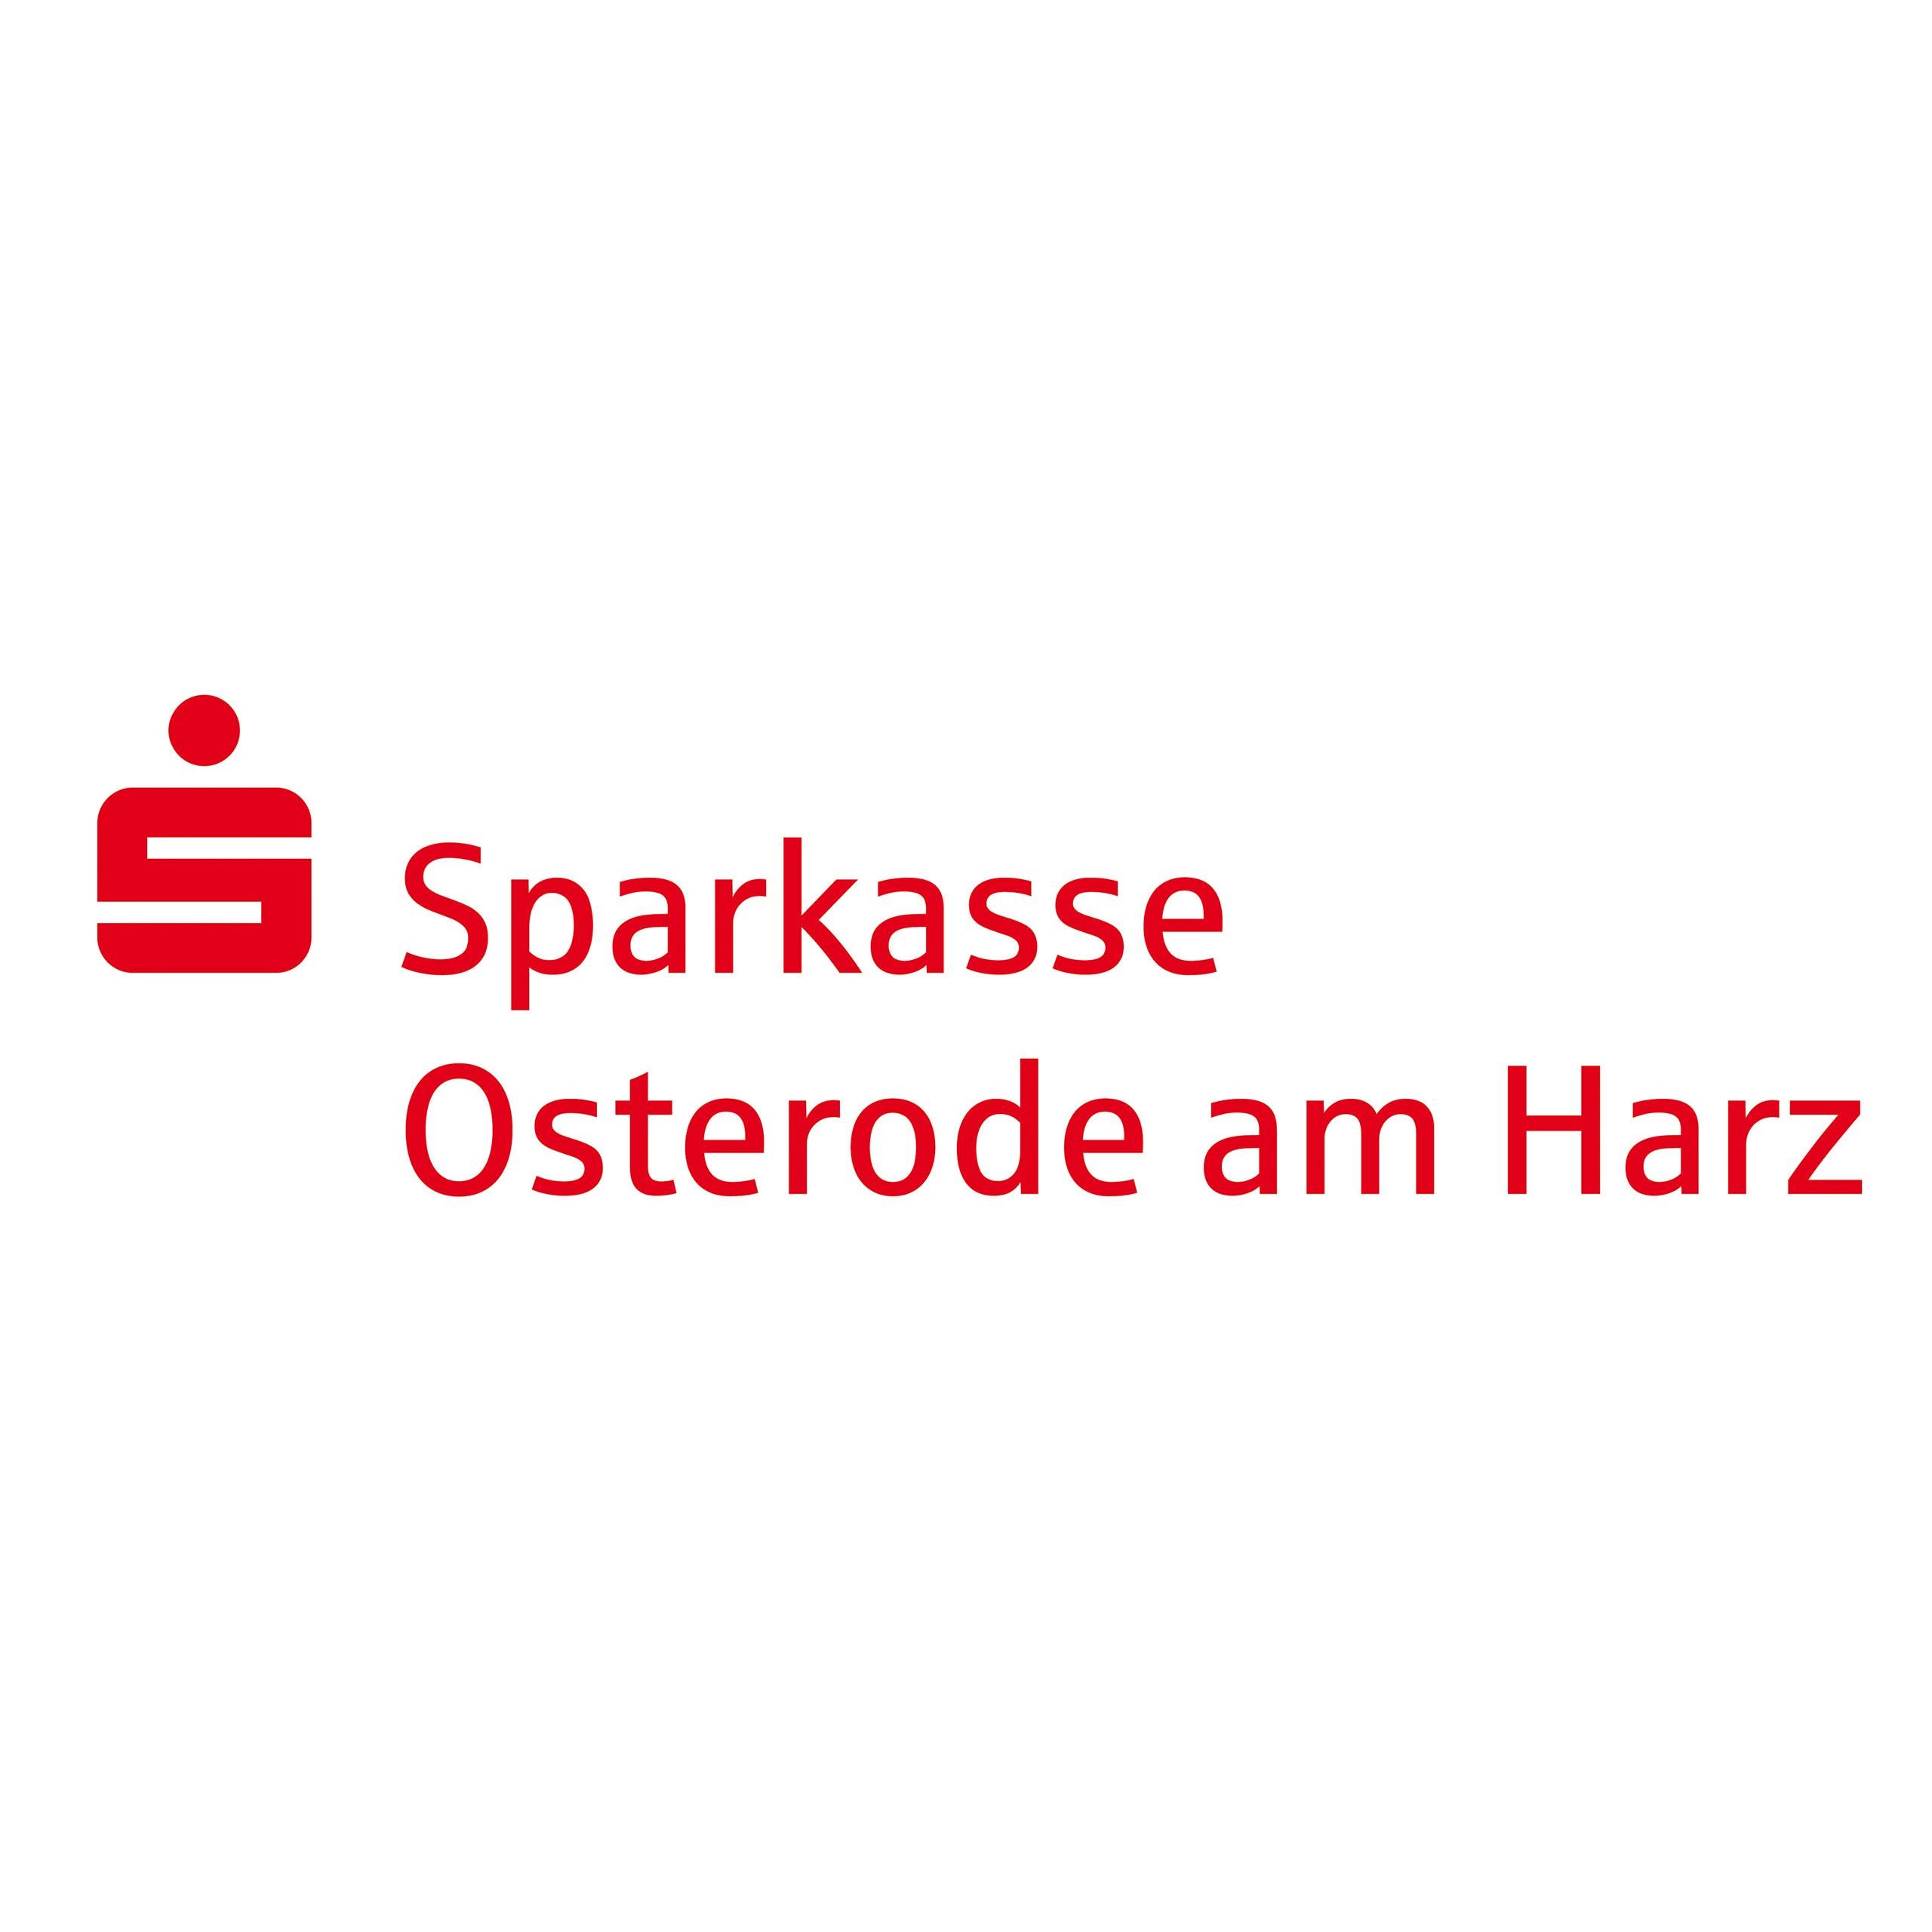 https://tuspopetershuette.de/wp-content/uploads/2020/01/sparkasse_weiss.jpg